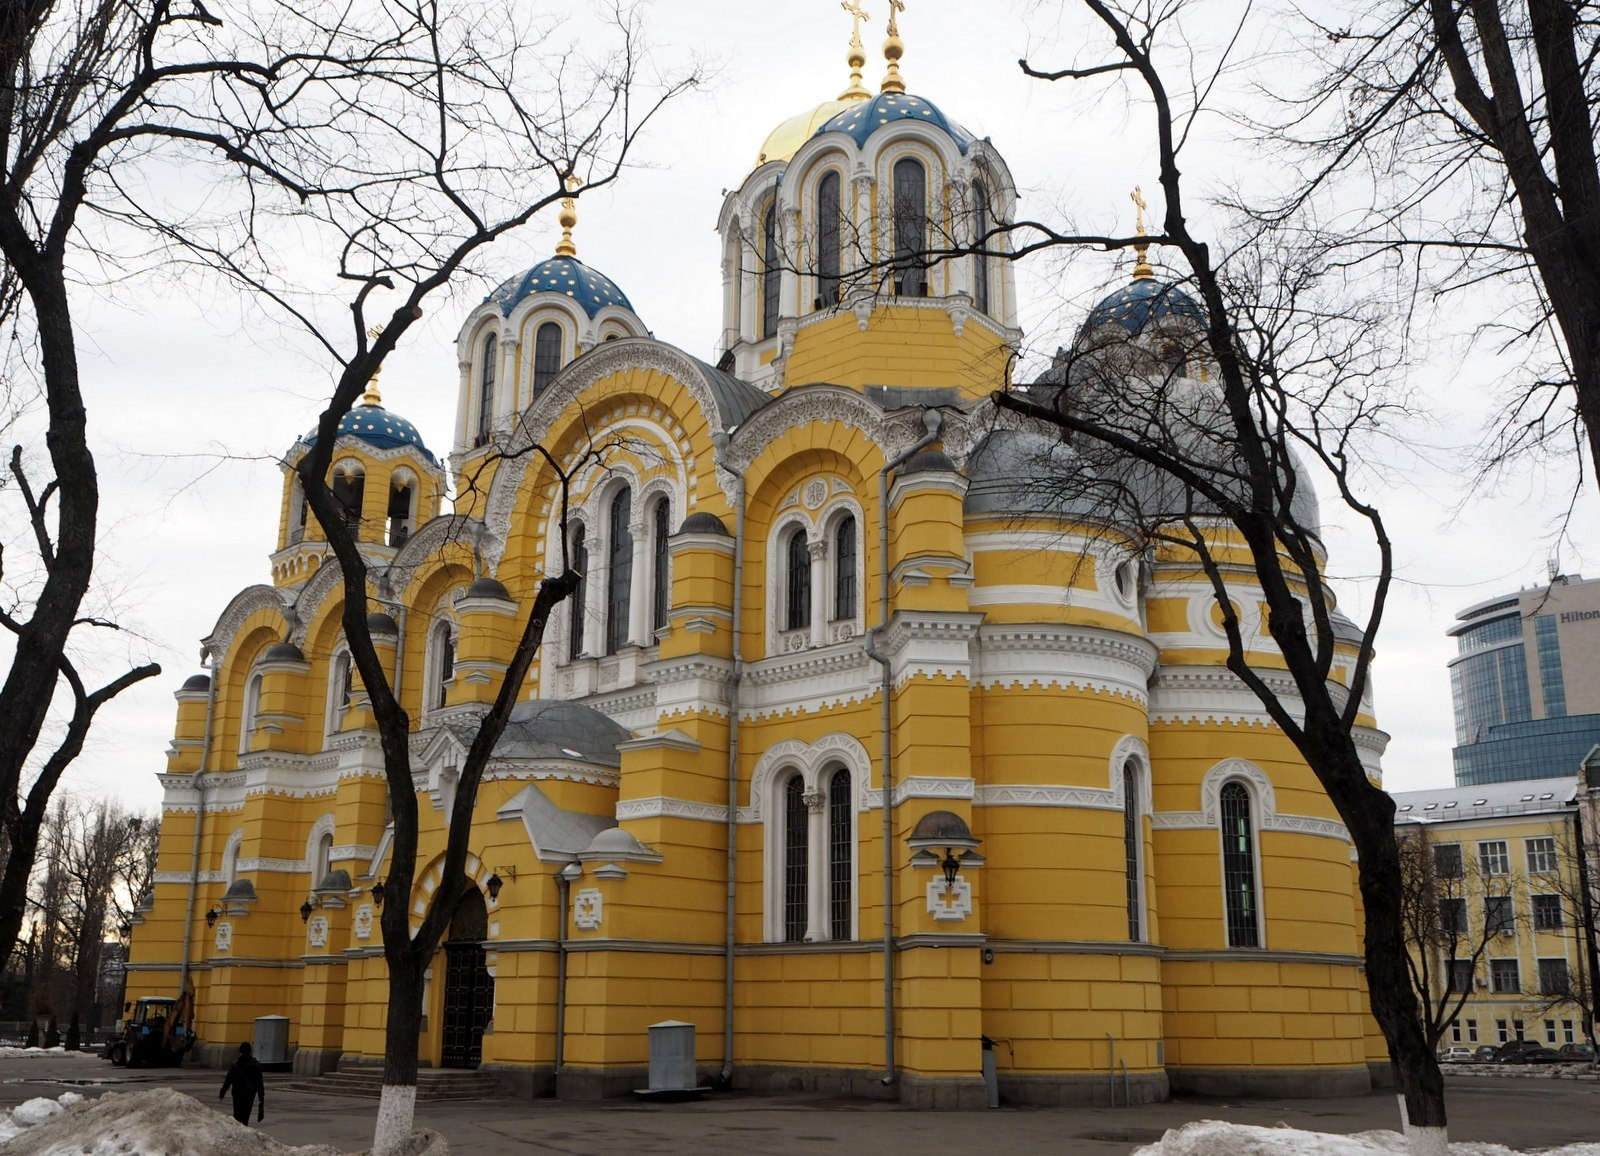 St Volodymyr Kiova